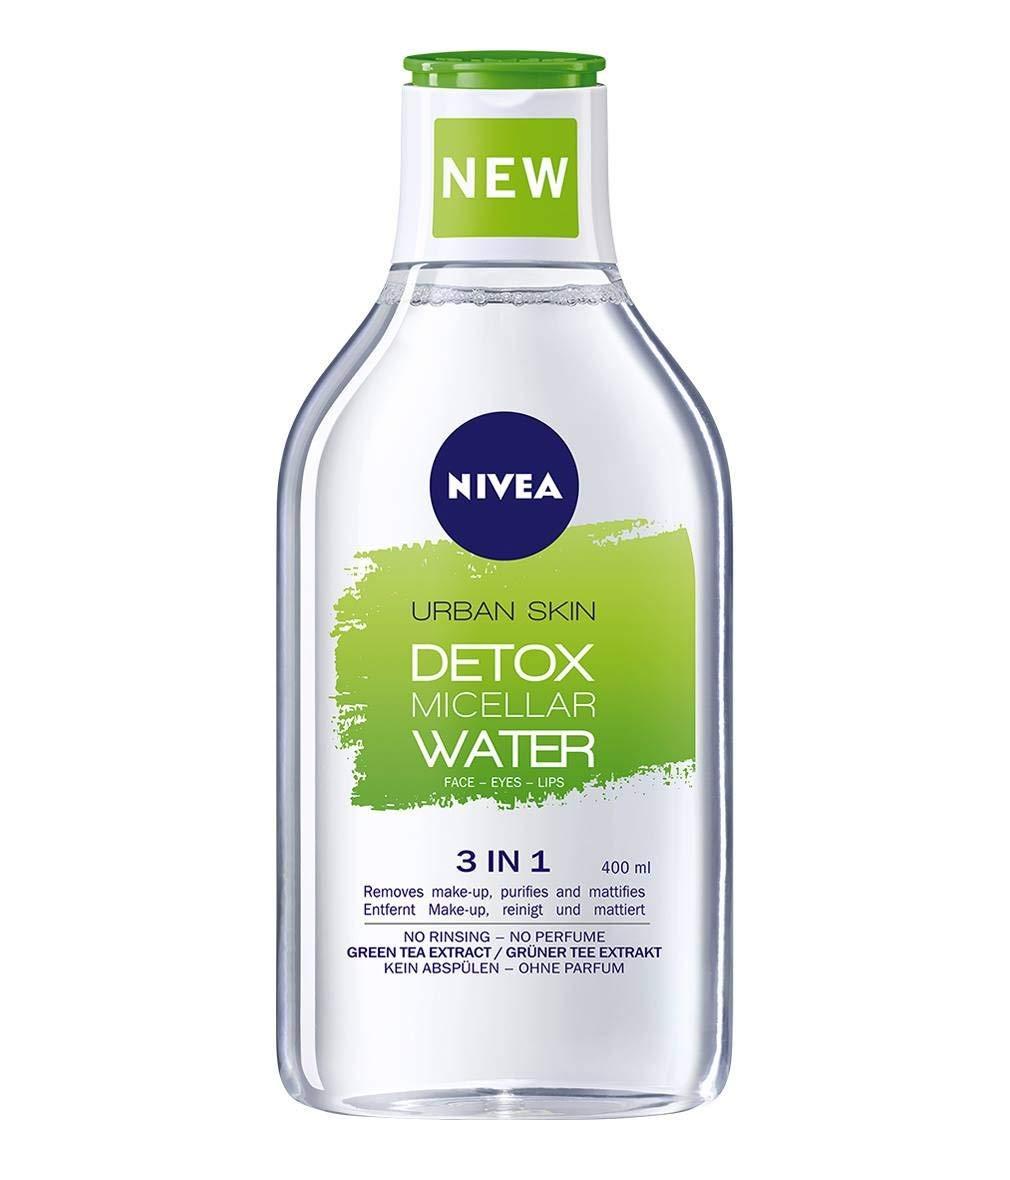 Nivea Urban Skin Detox Micellar Water all-in-1 make up remover - Combination/Oily Skin 400 ml